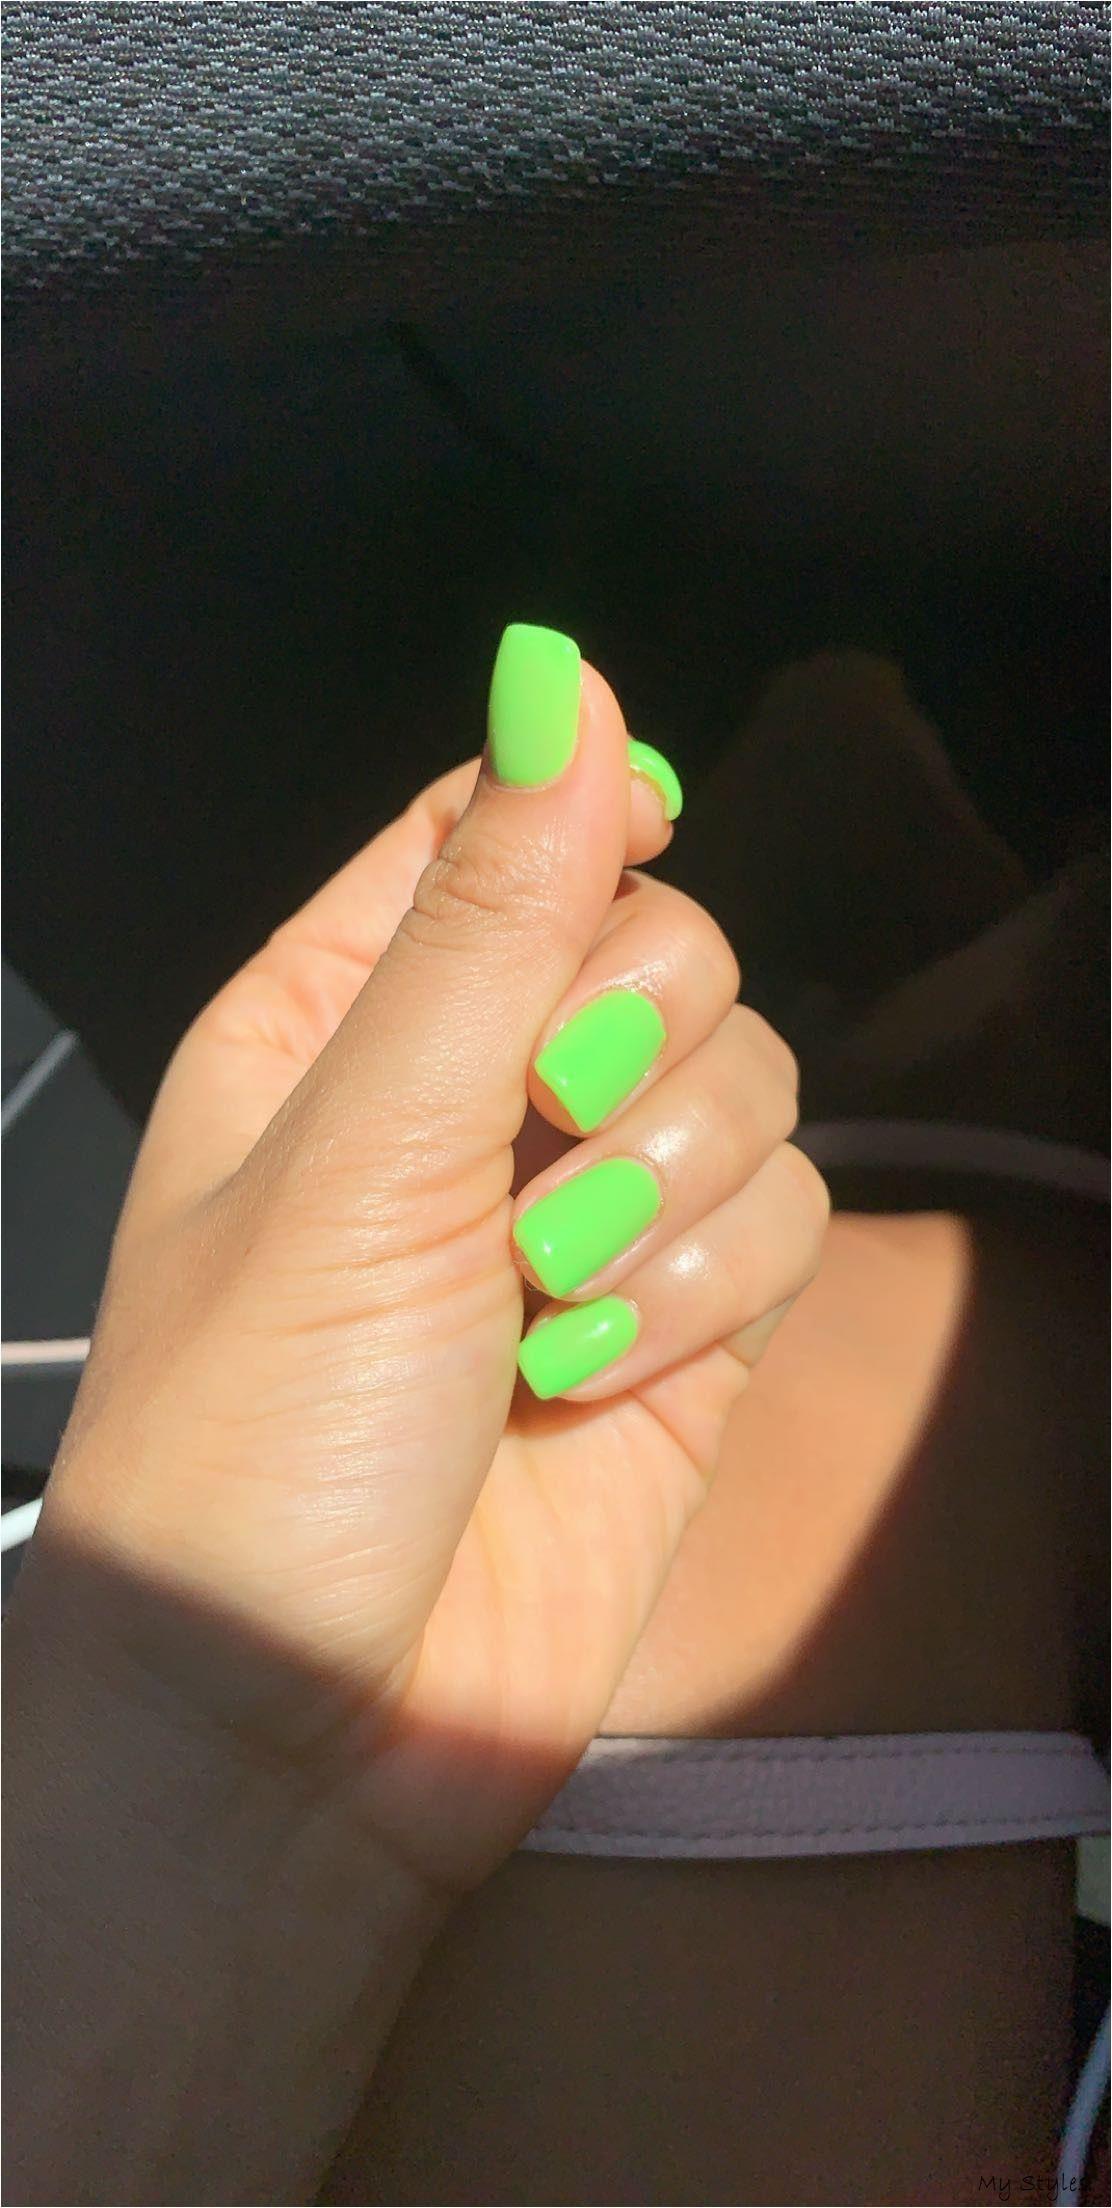 Neon nails -   - #beachNails #birthdayNails #chromeNails #classyNails #darkNails- #fake #nail in 2020   Neon green nails, Green nails, Neon nails